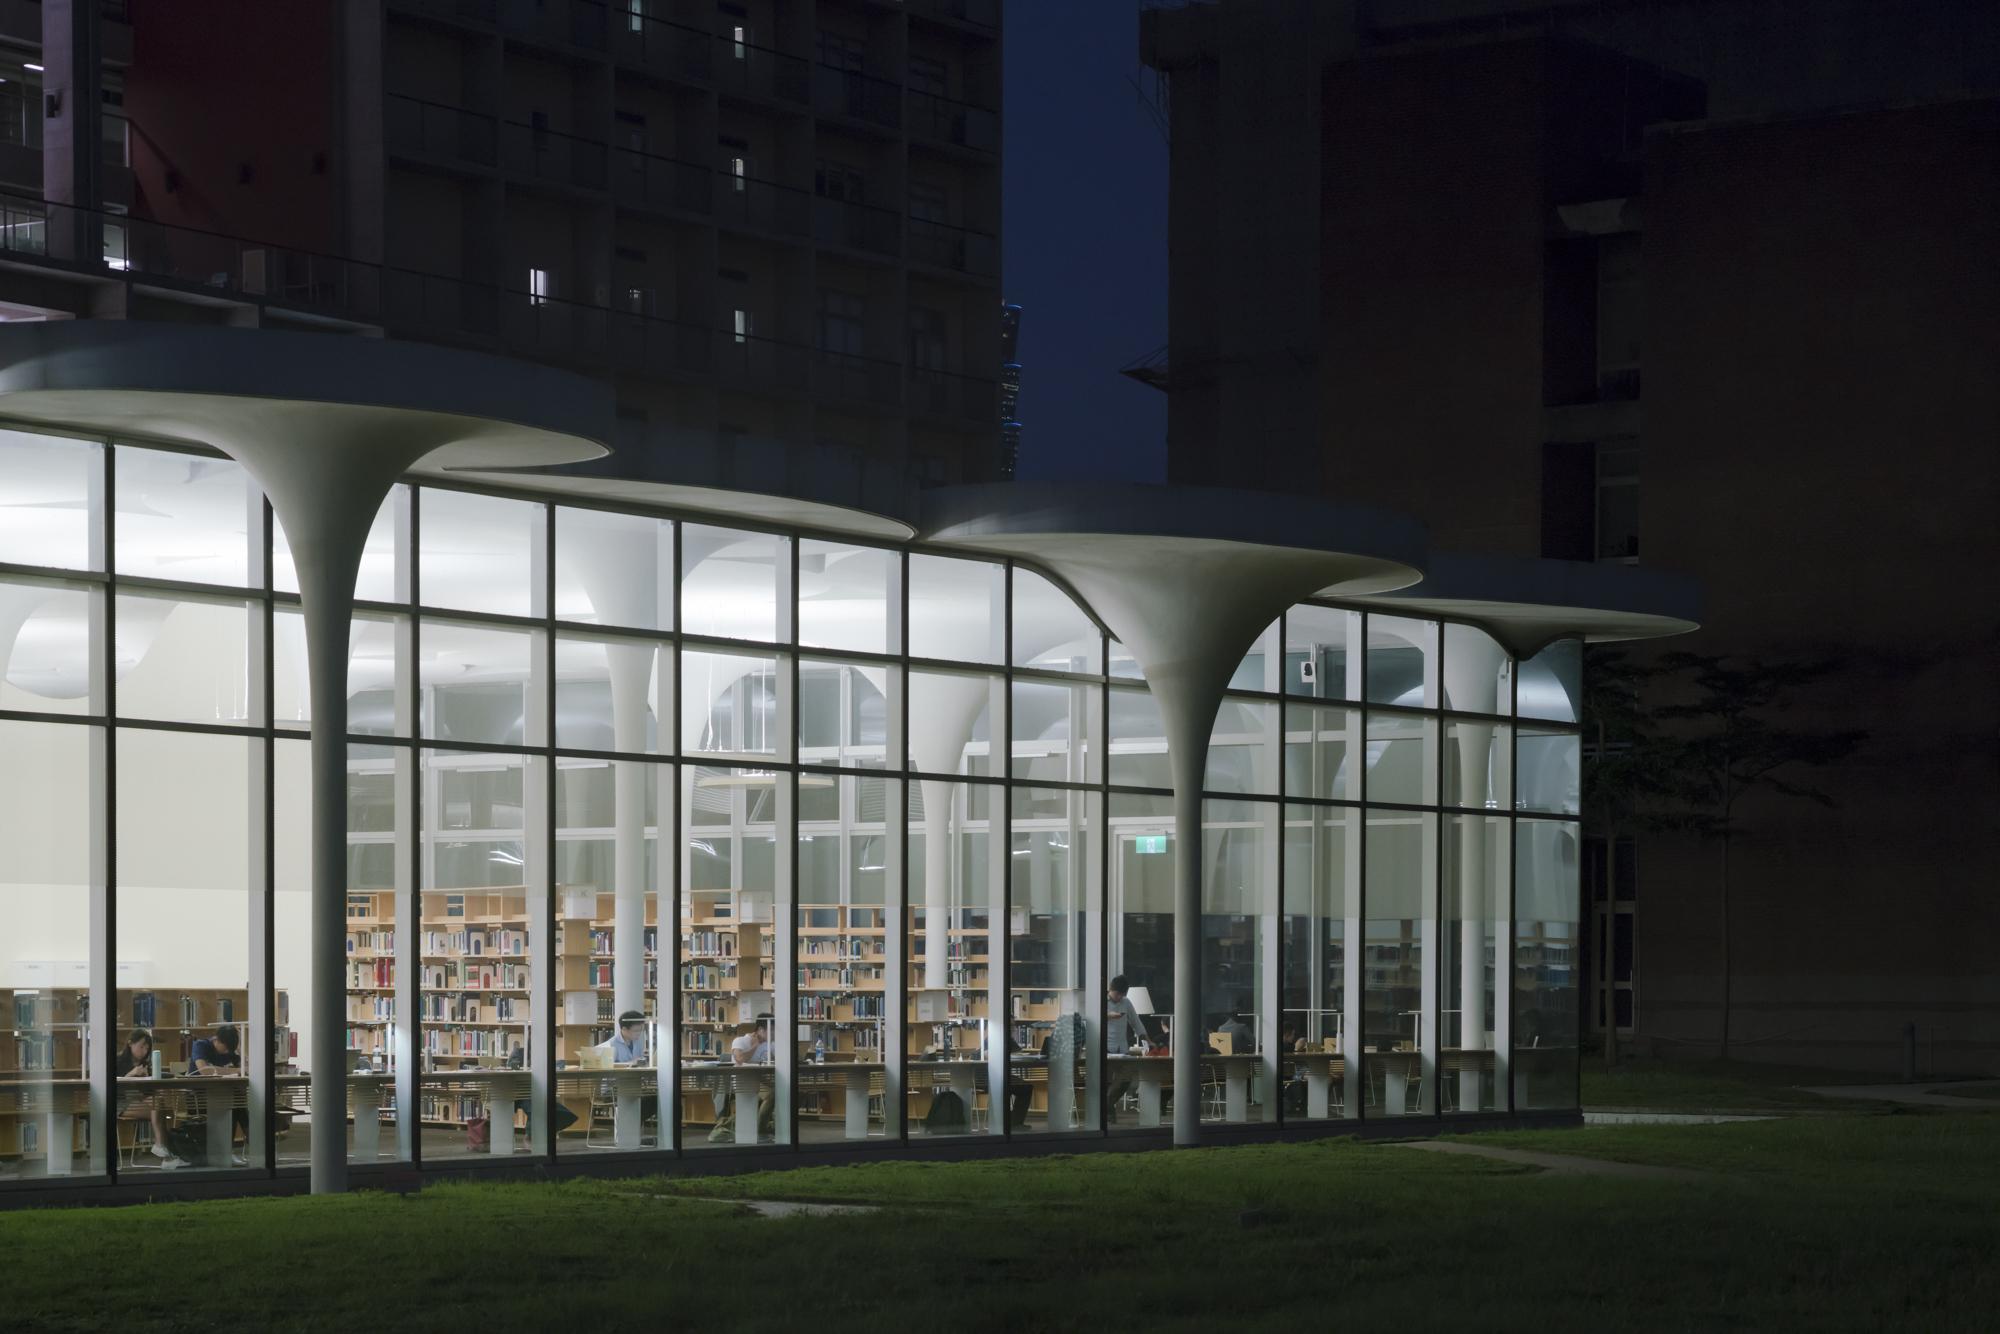 National Taiwan University — Studio Periphery